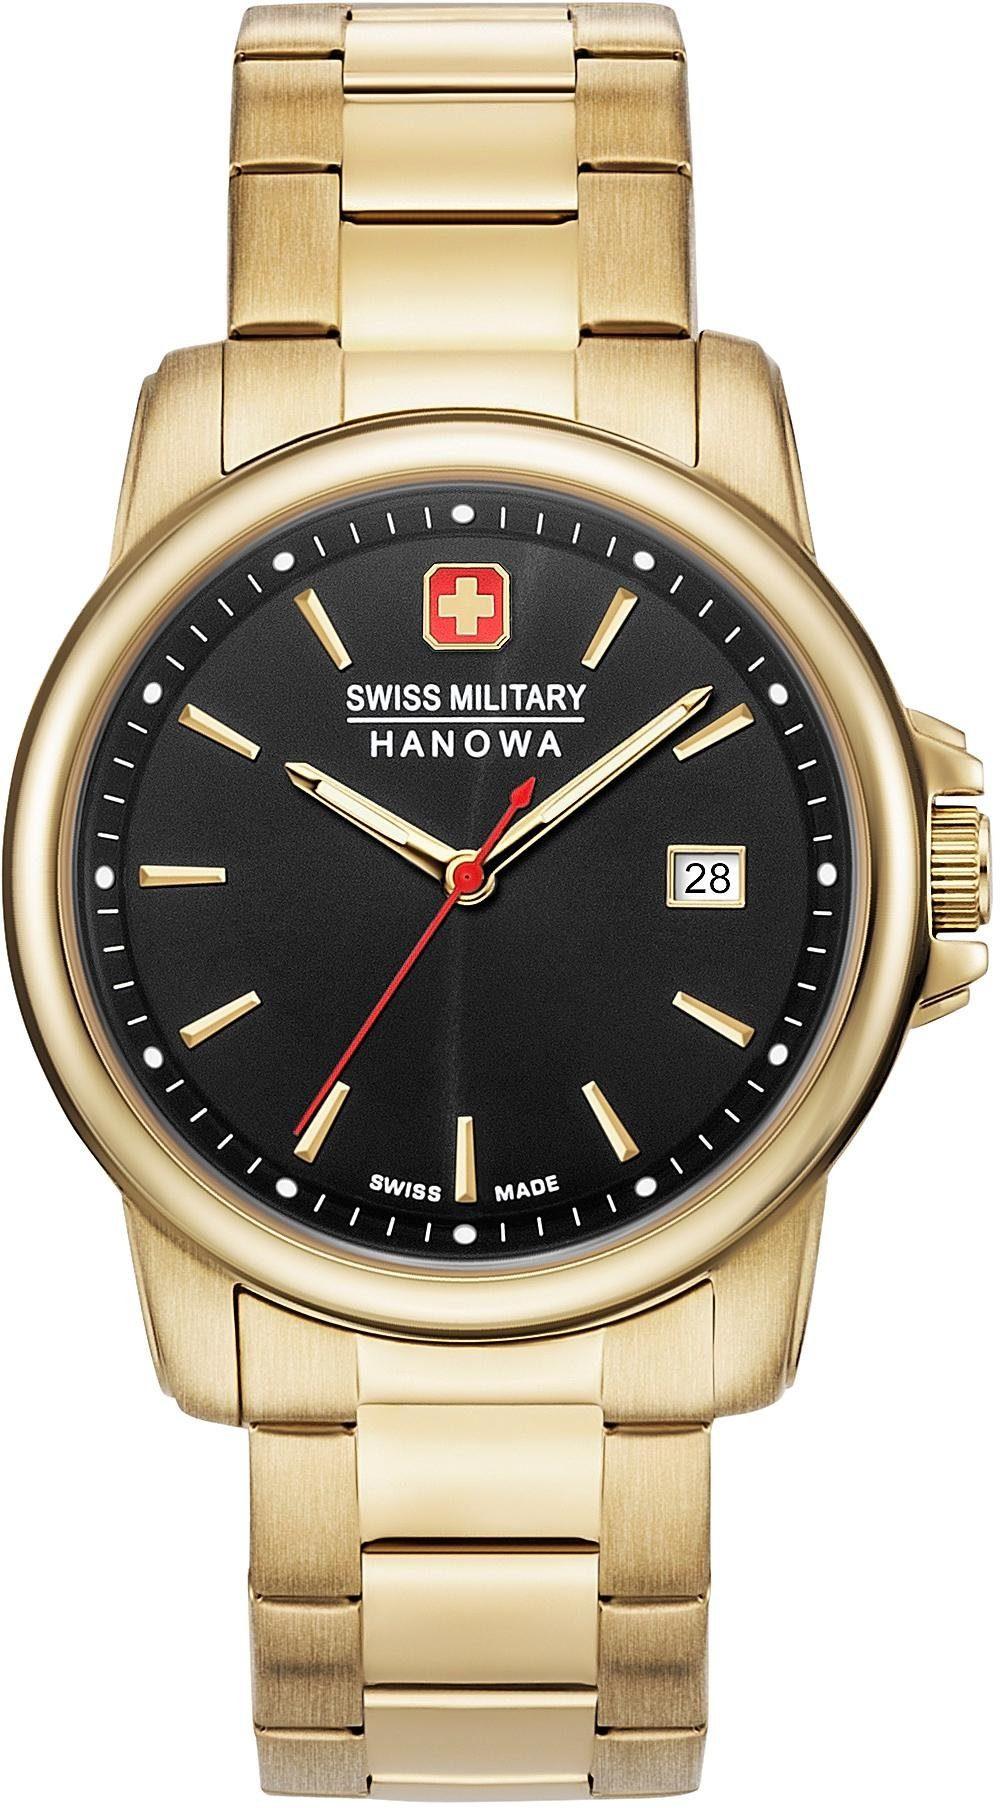 Swiss Military Hanowa Schweizer Uhr SWISS RECRUIT II 06-5230702007 | Uhren > Schweizer Uhren | Swiss Military Hanowa